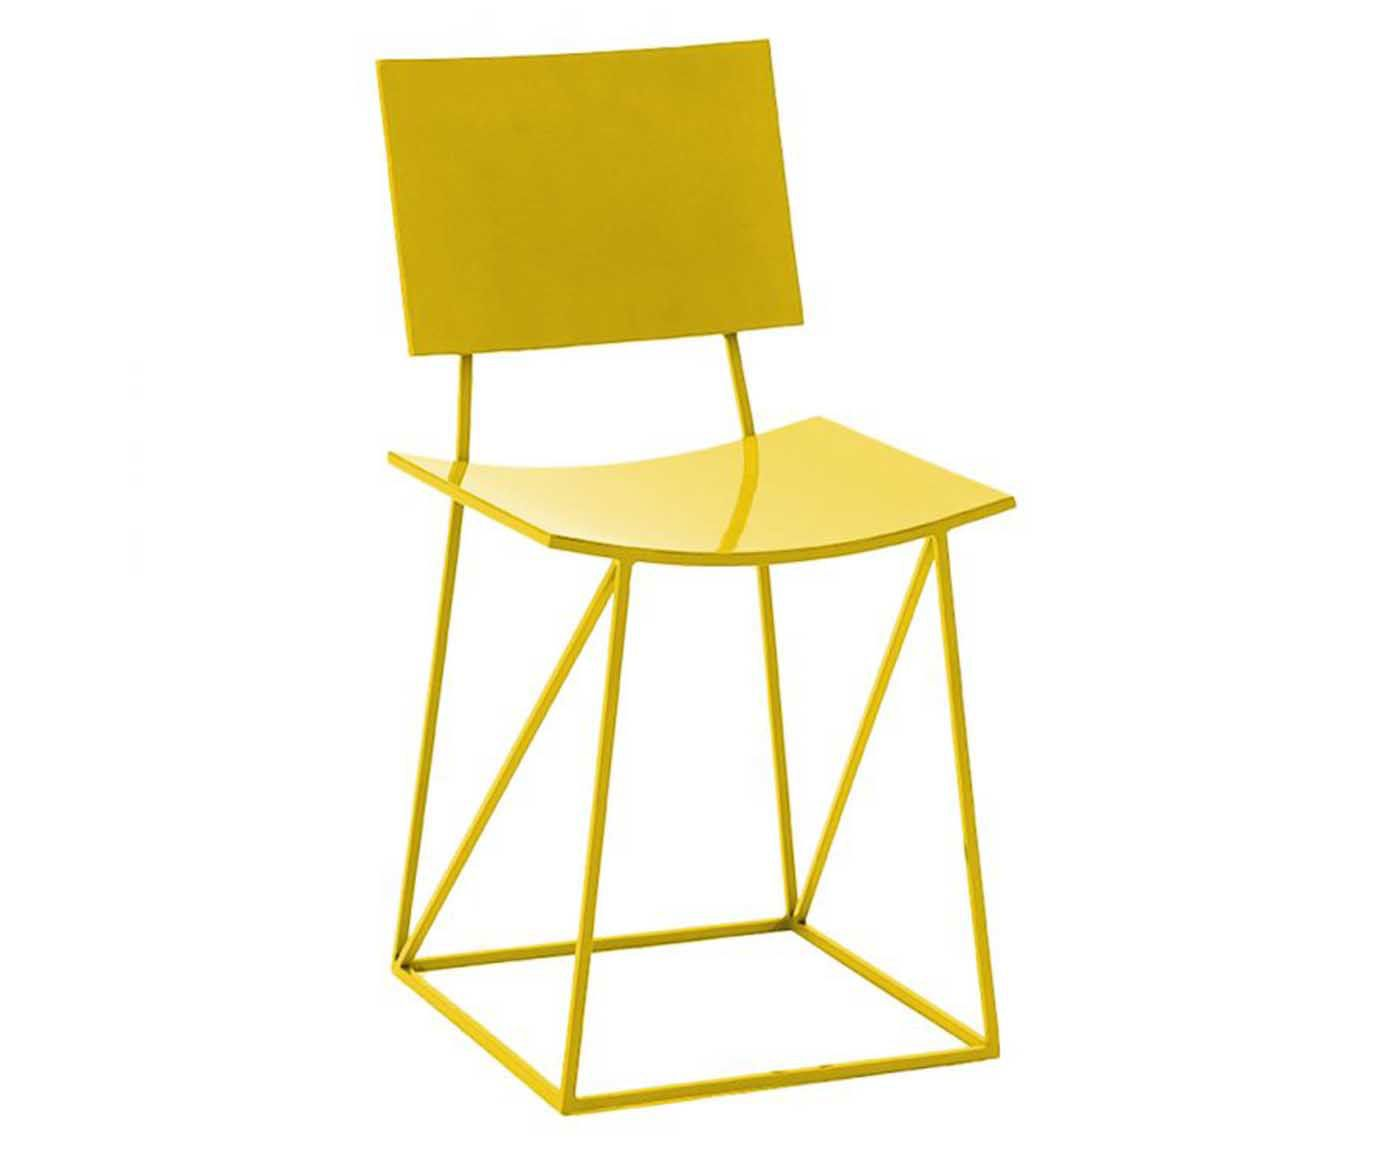 Cadeira charm - soleil | Westwing.com.br